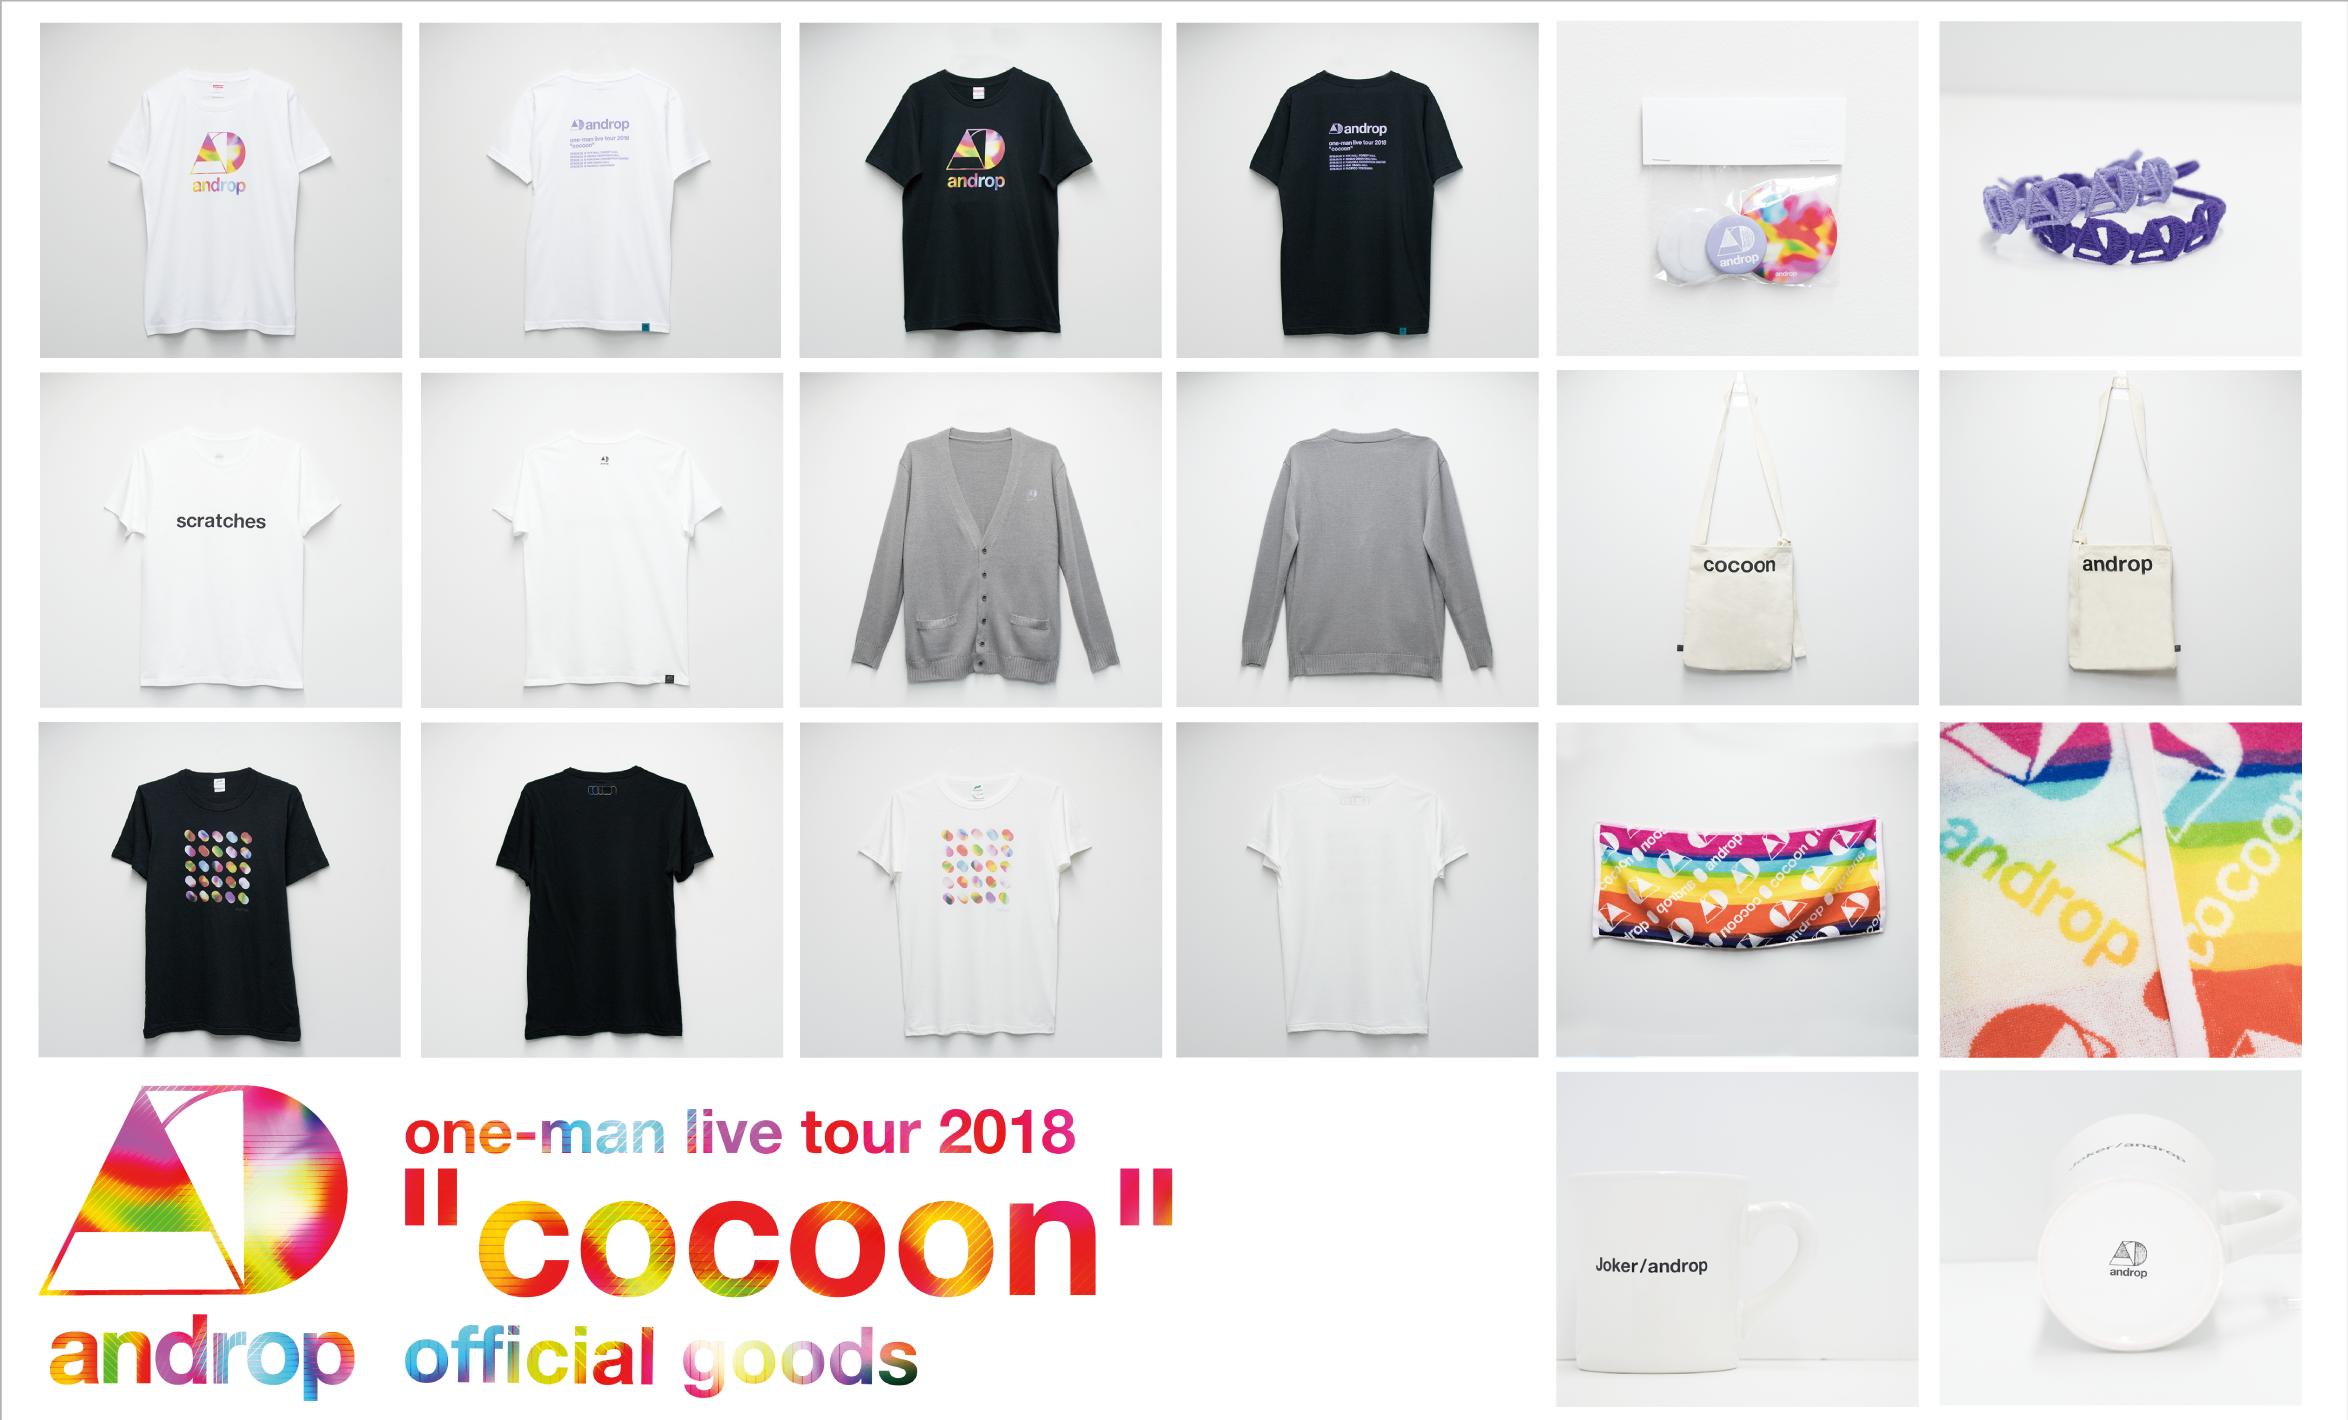 one-man live tour 2018goods